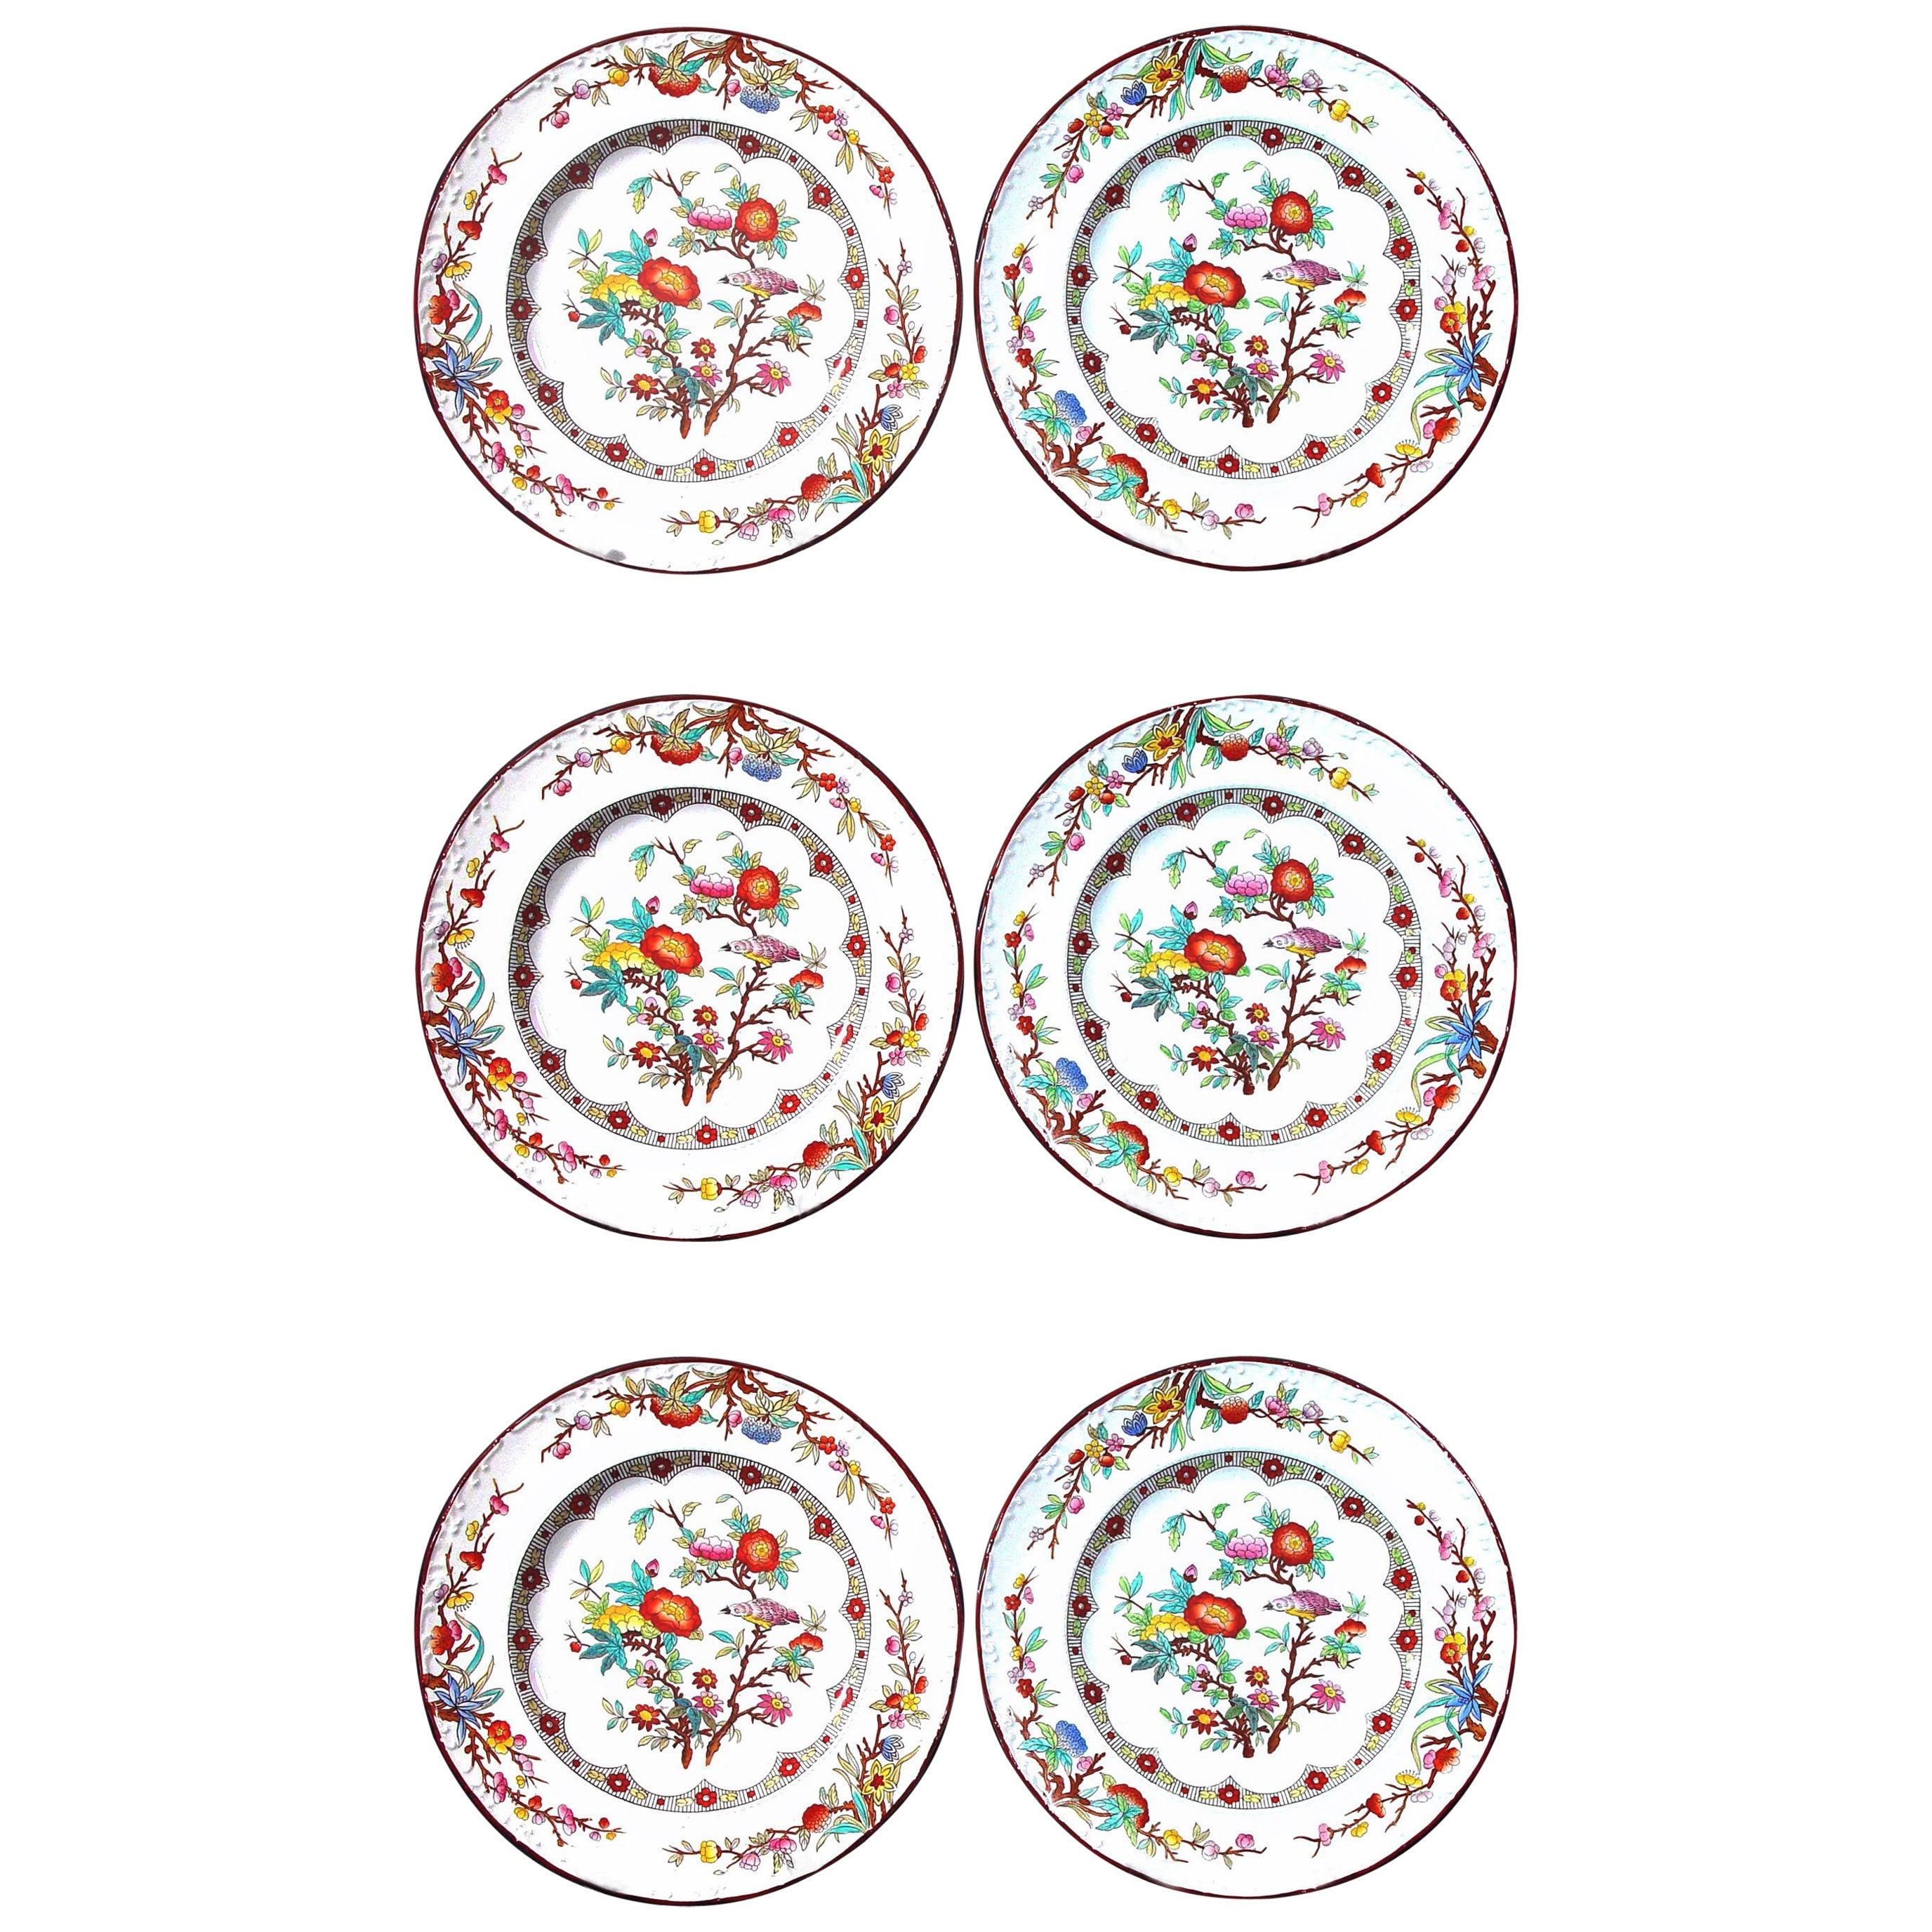 Wedgwood Set of Six Pearlware Botanical Plates, circa 1870